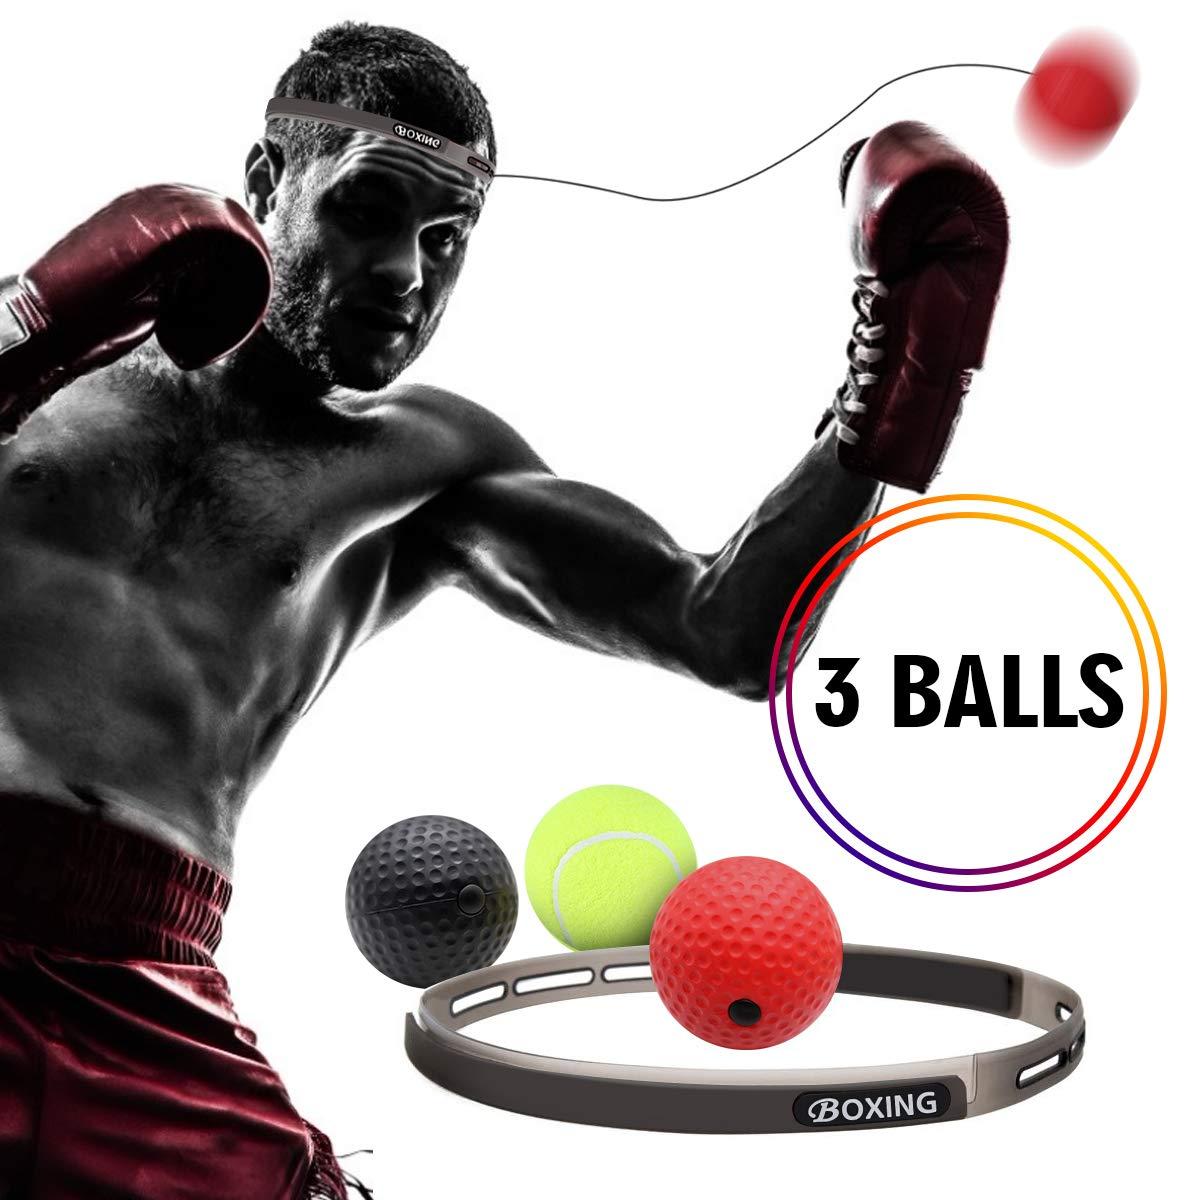 2 Pack Senston Tennis Training Ball with String for Tennis Trainer Boxing Fight Training Balls